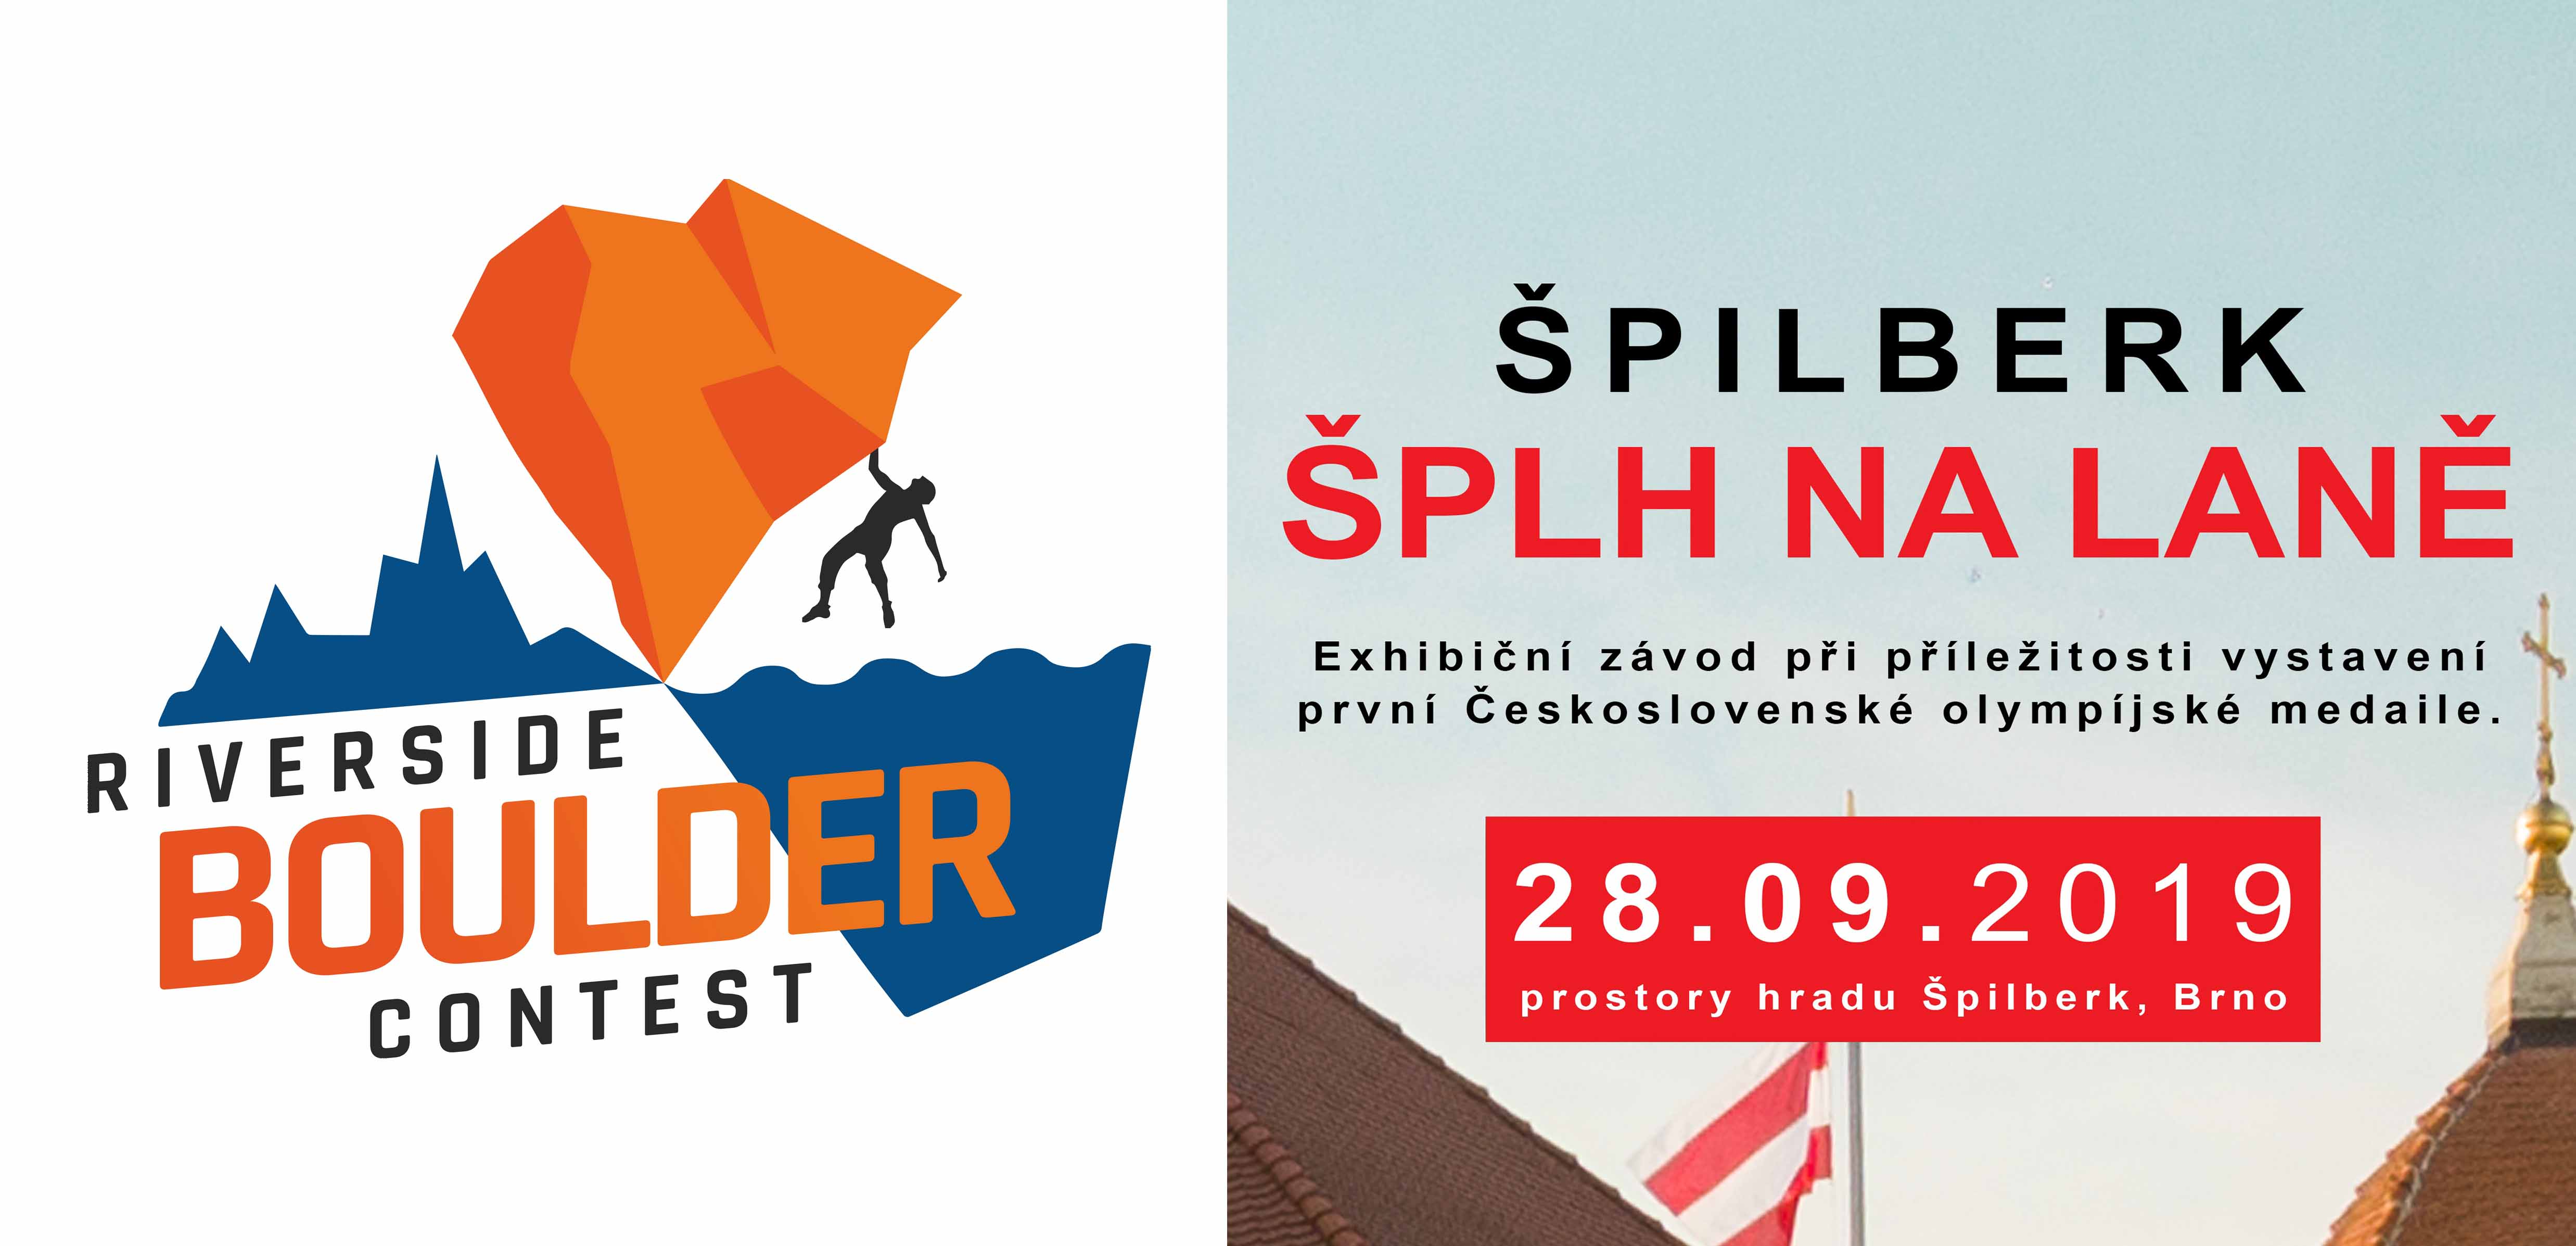 Exhibice Riverside Boulder Contest & Branky Body Brno - Špilberk 2019